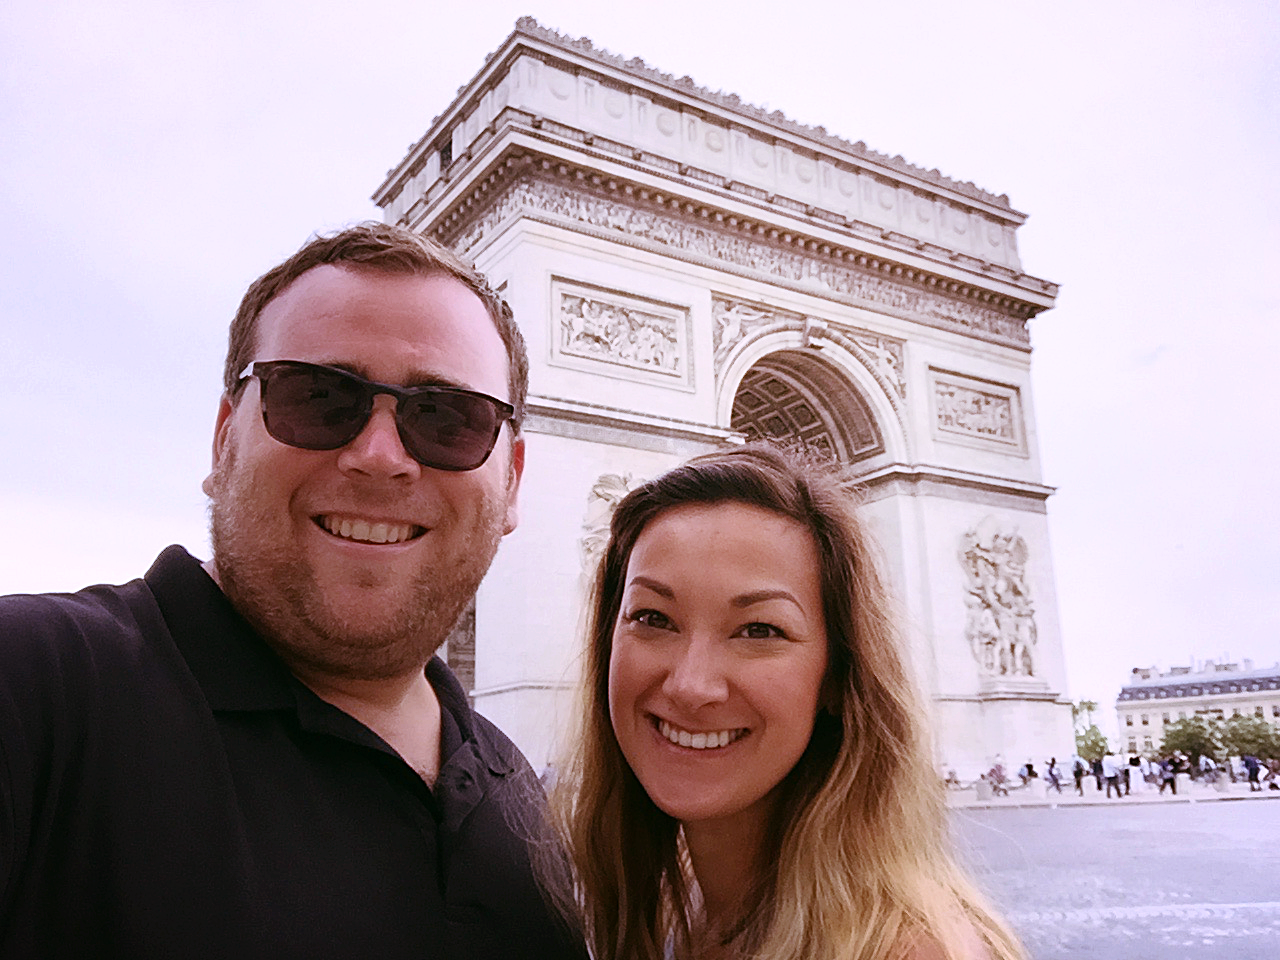 Adrian and Ashlee outside the Arc de Triomphe de l'Étoile -- careful crossing the street!